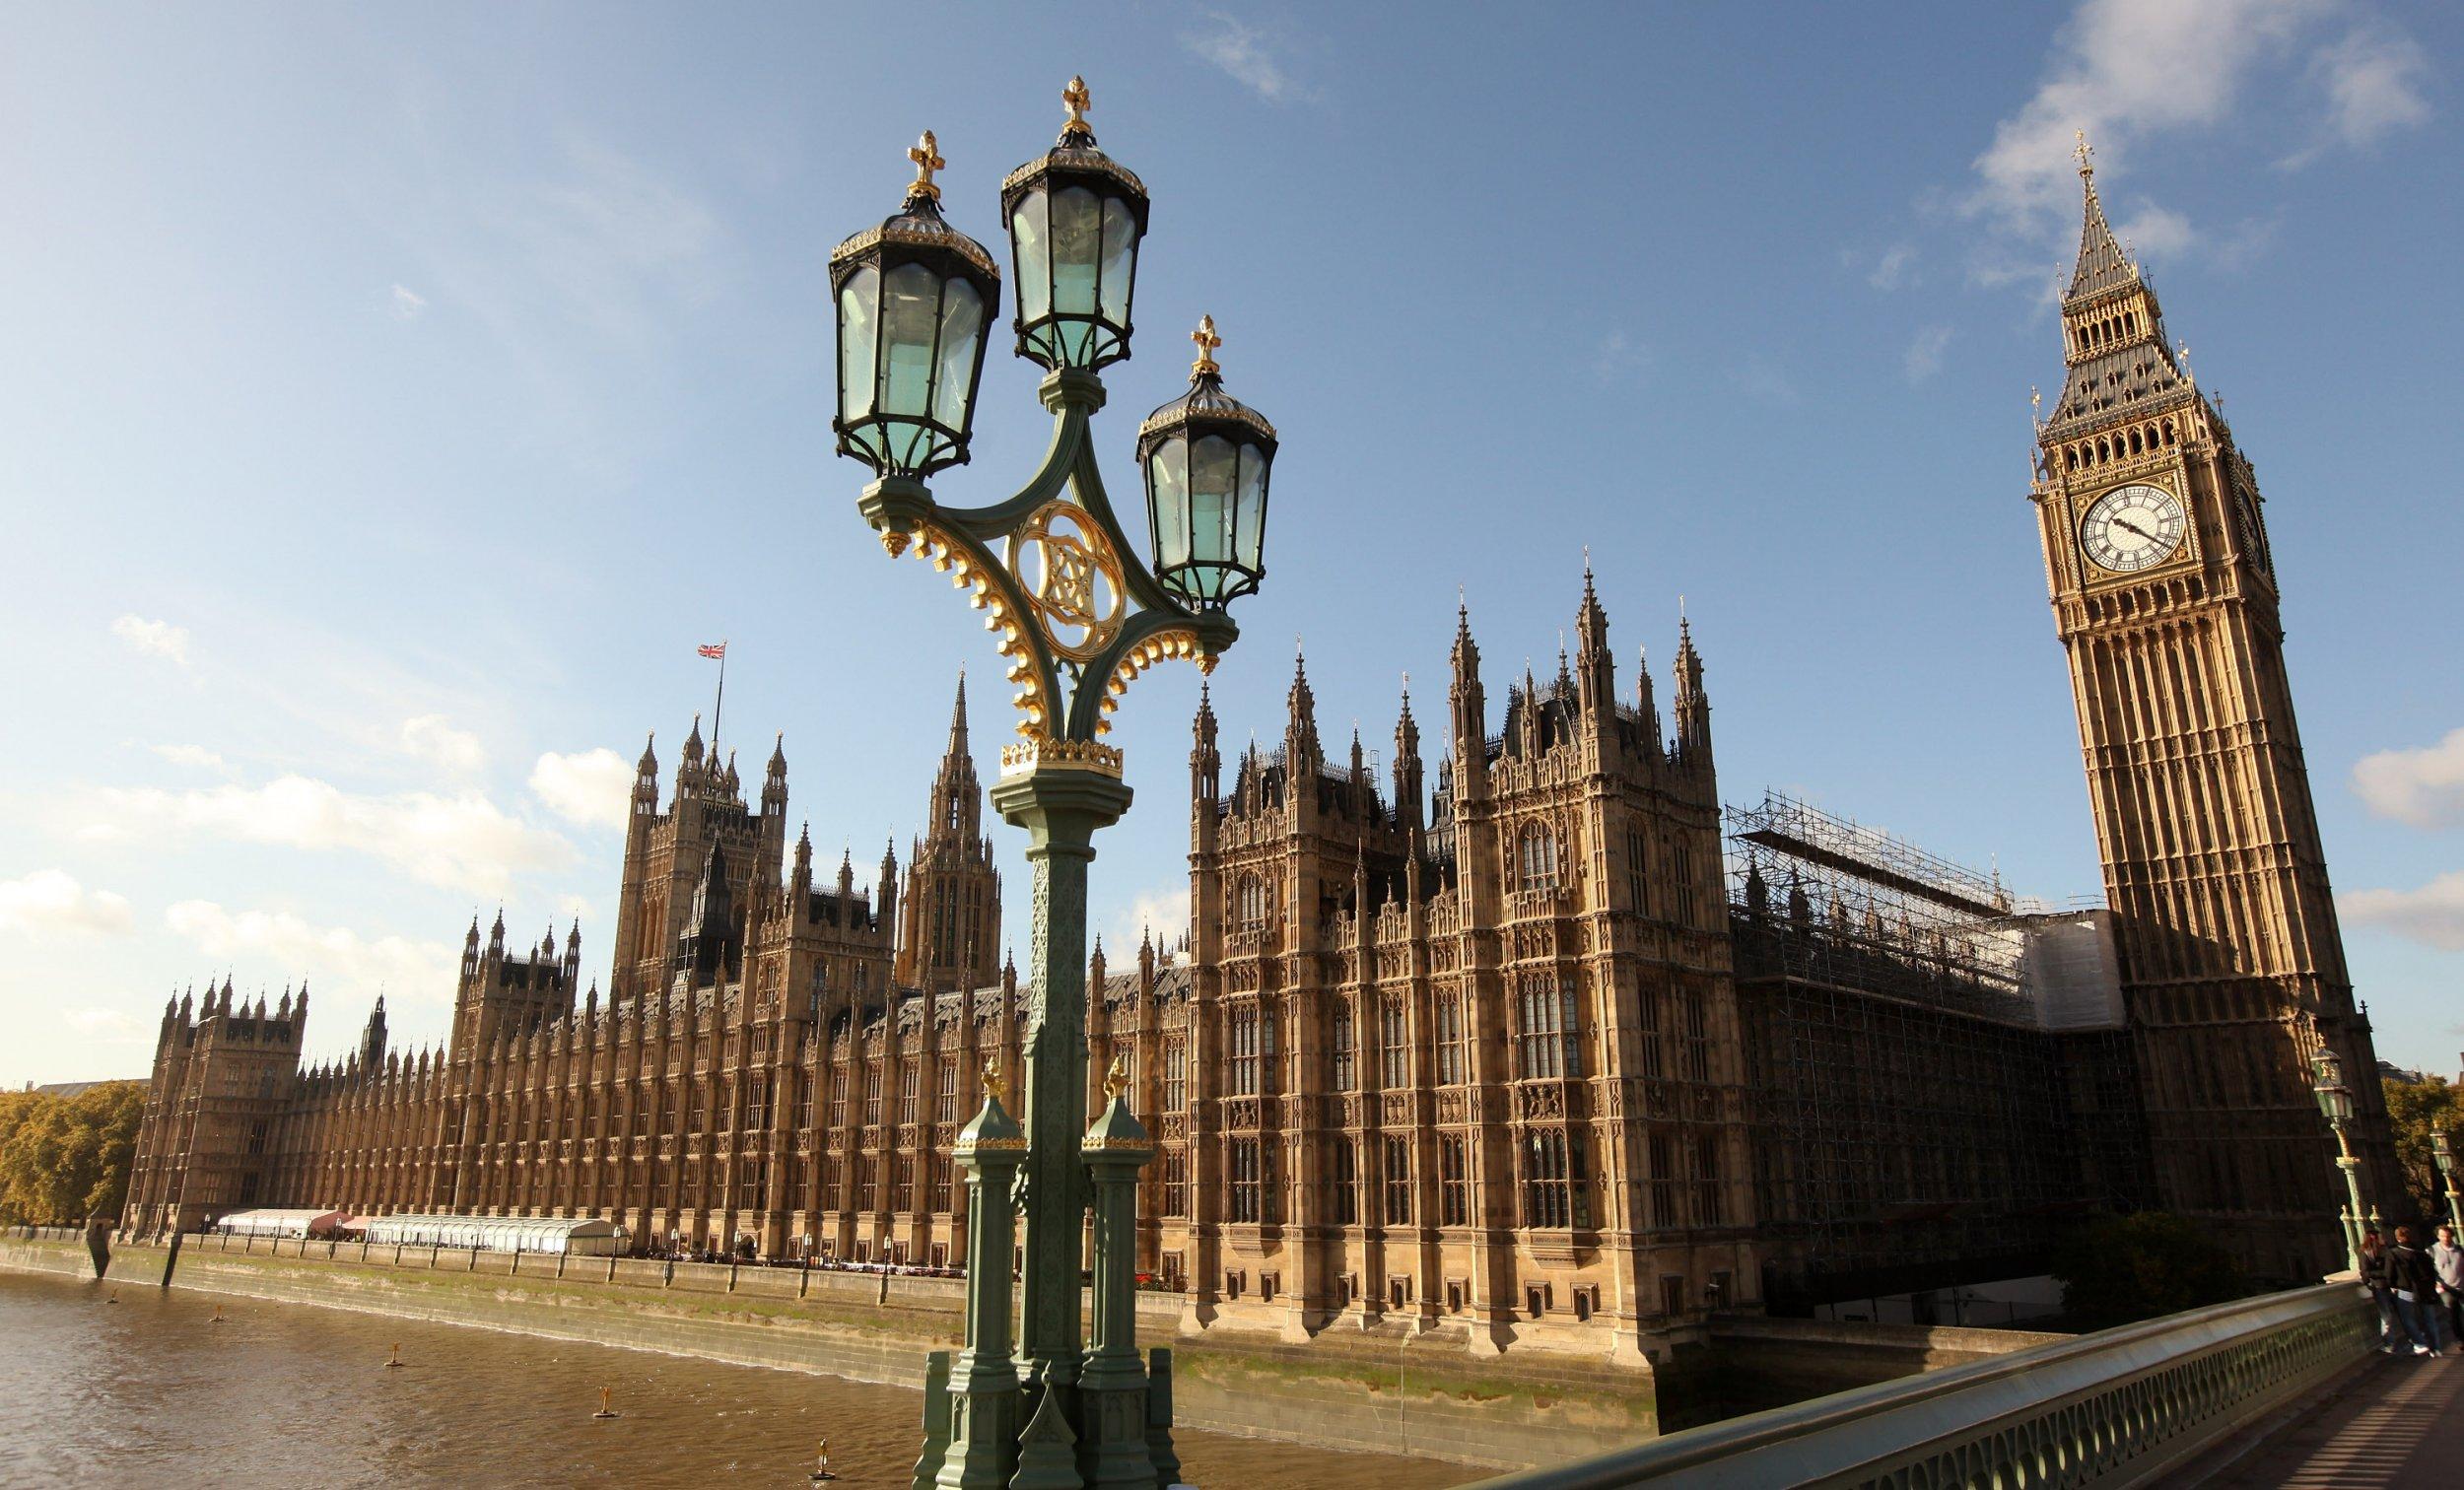 01_08_Parliament_01